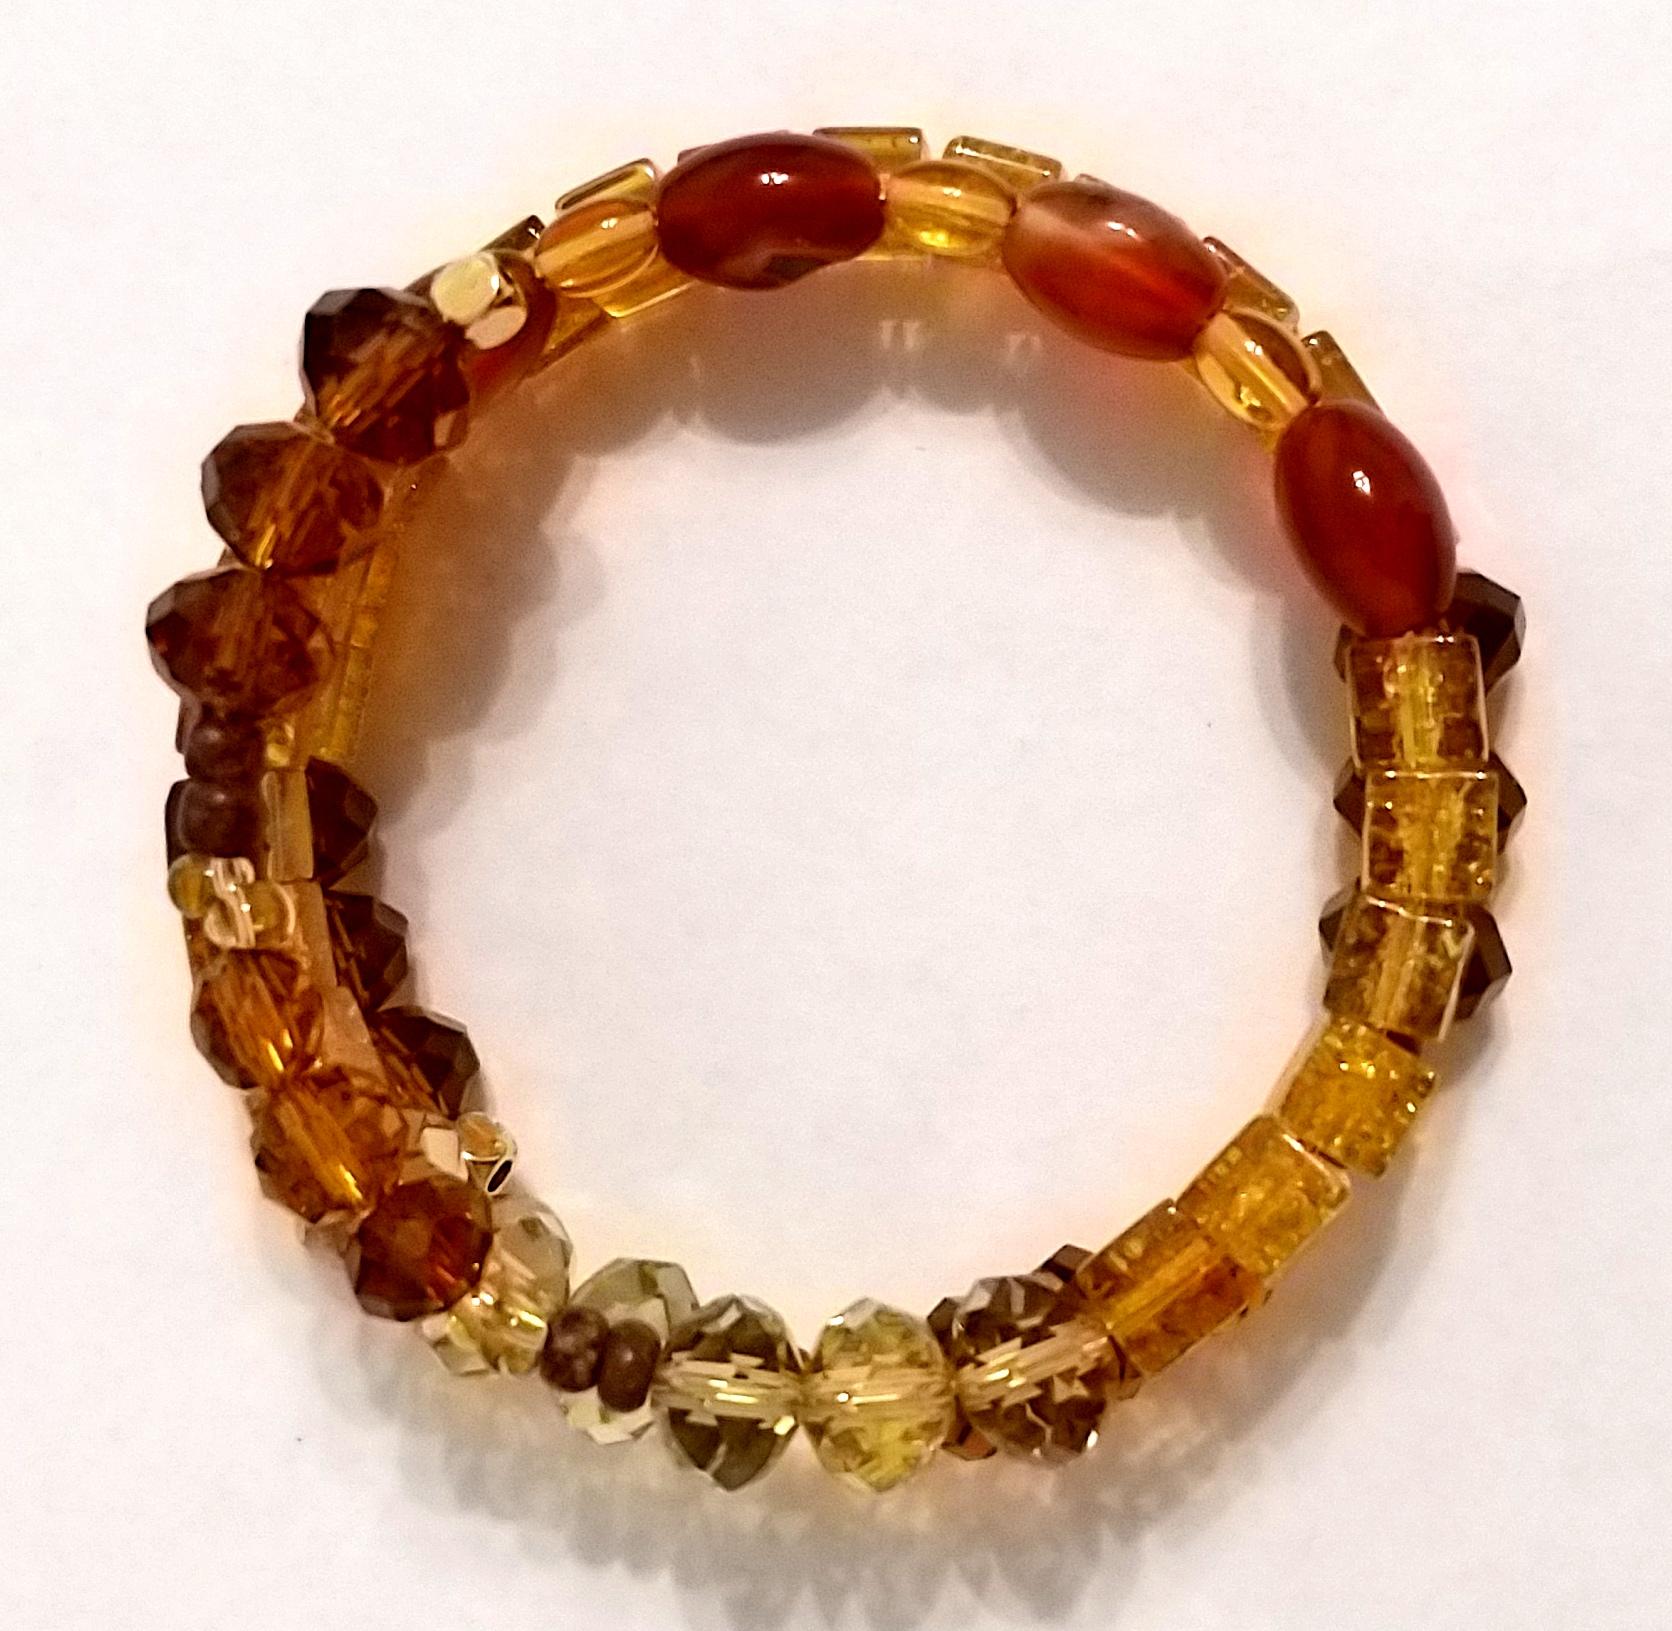 #FP-B 190820 bracelet  suggested $22 usd